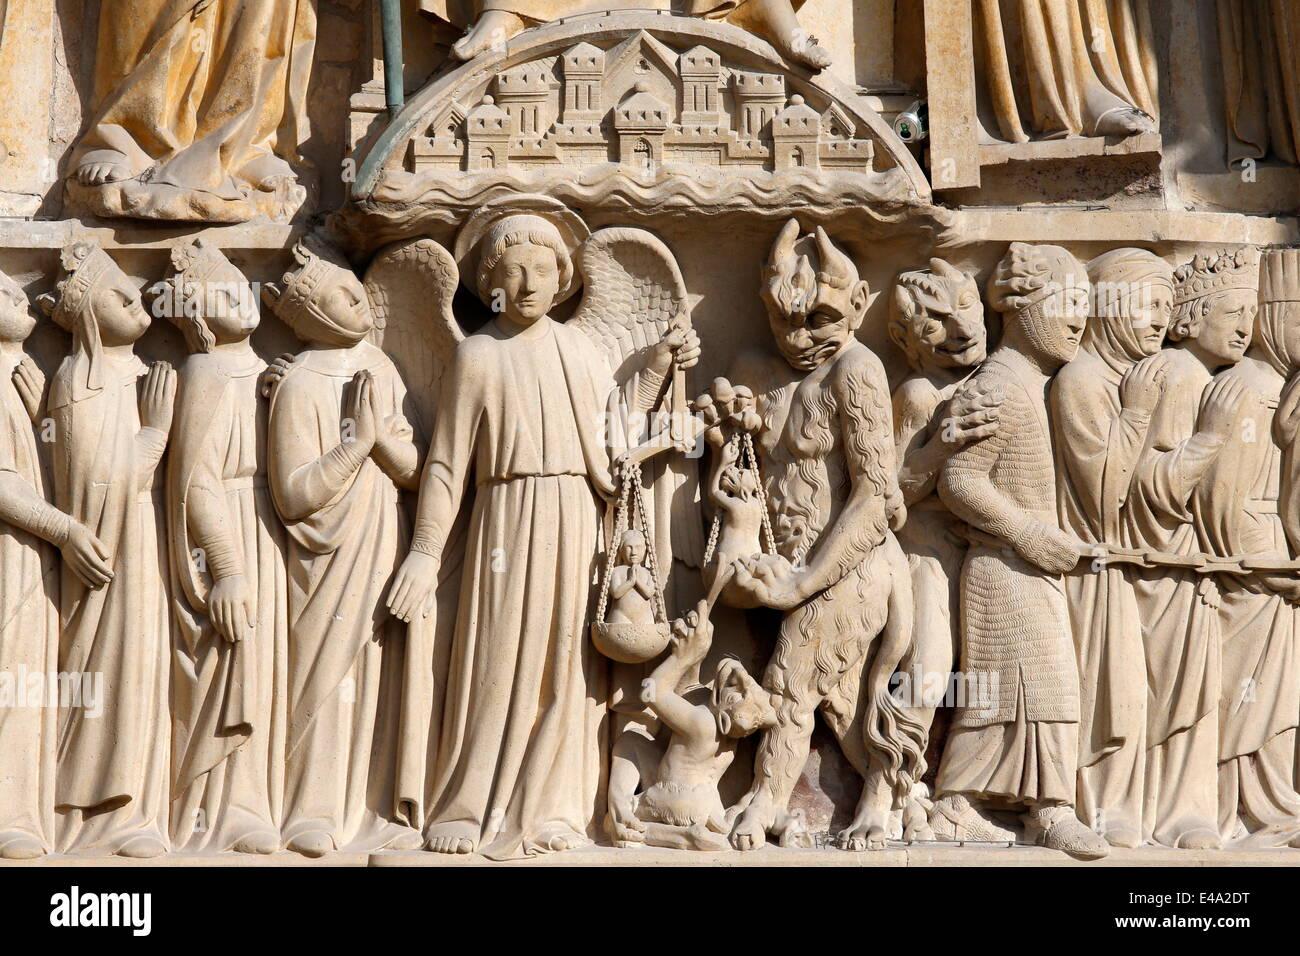 St. Michael weighing the souls, Portal of the Last Judgement, Western facade, Notre Dame de Paris Cathedral, Paris, - Stock Image